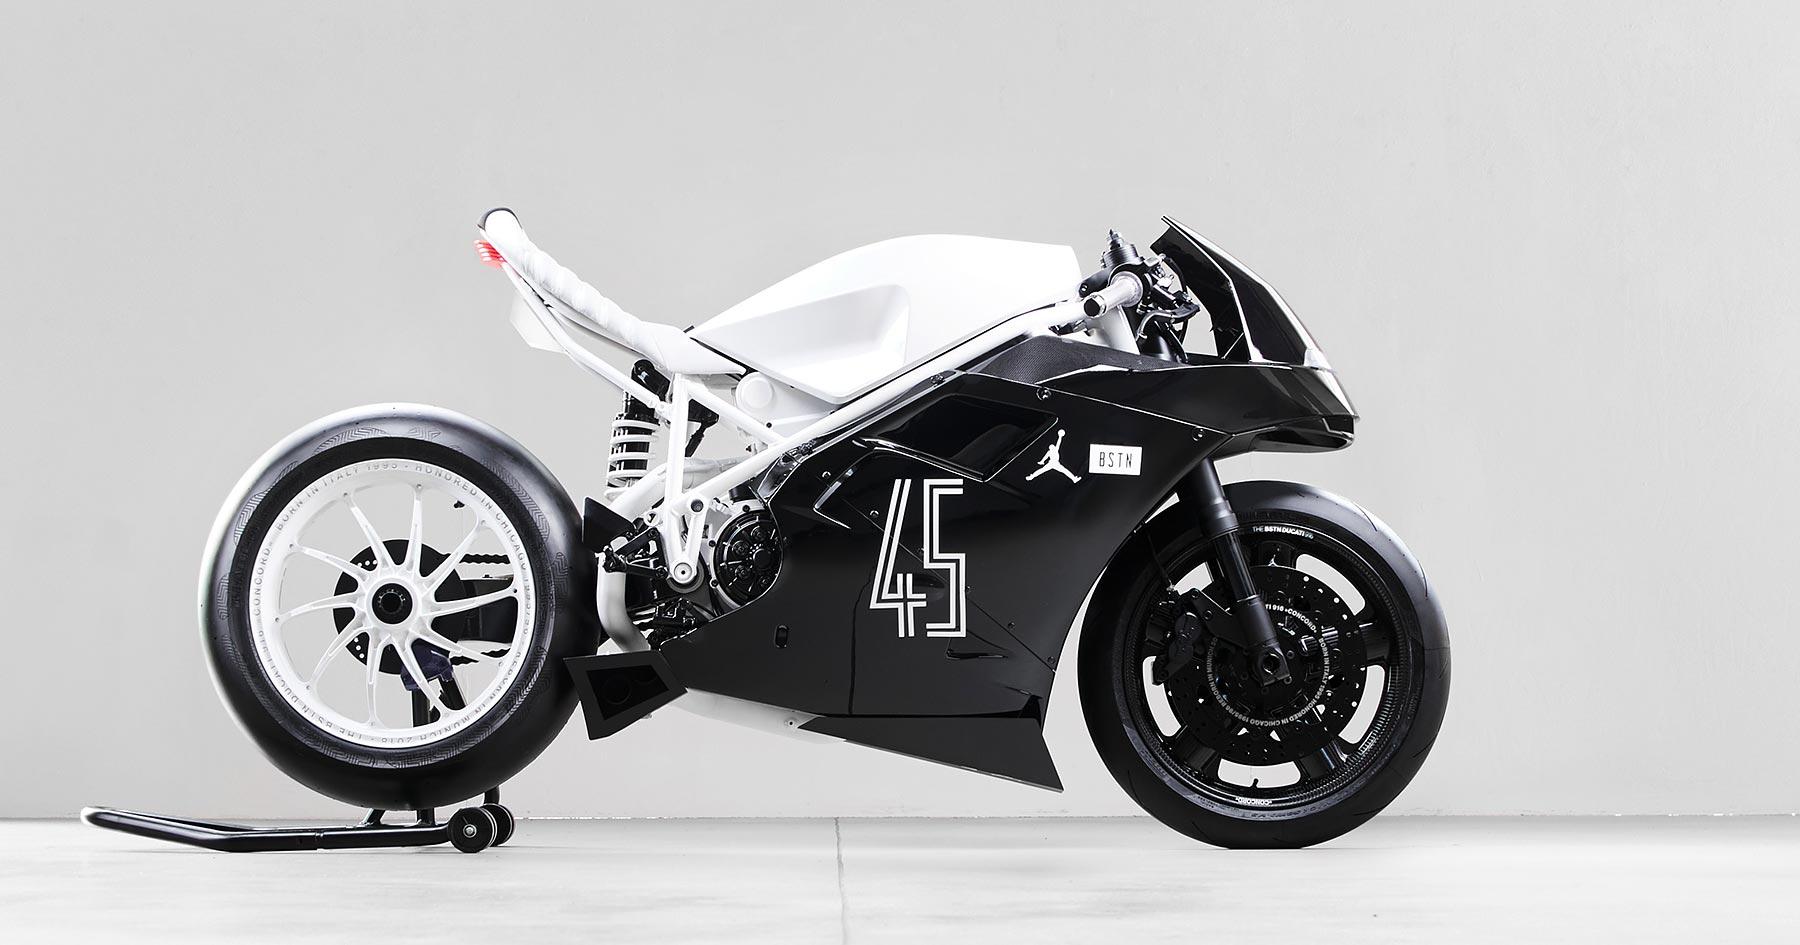 Icy Fresh: the Impuls x BSTN Ducati 916 'Concord'